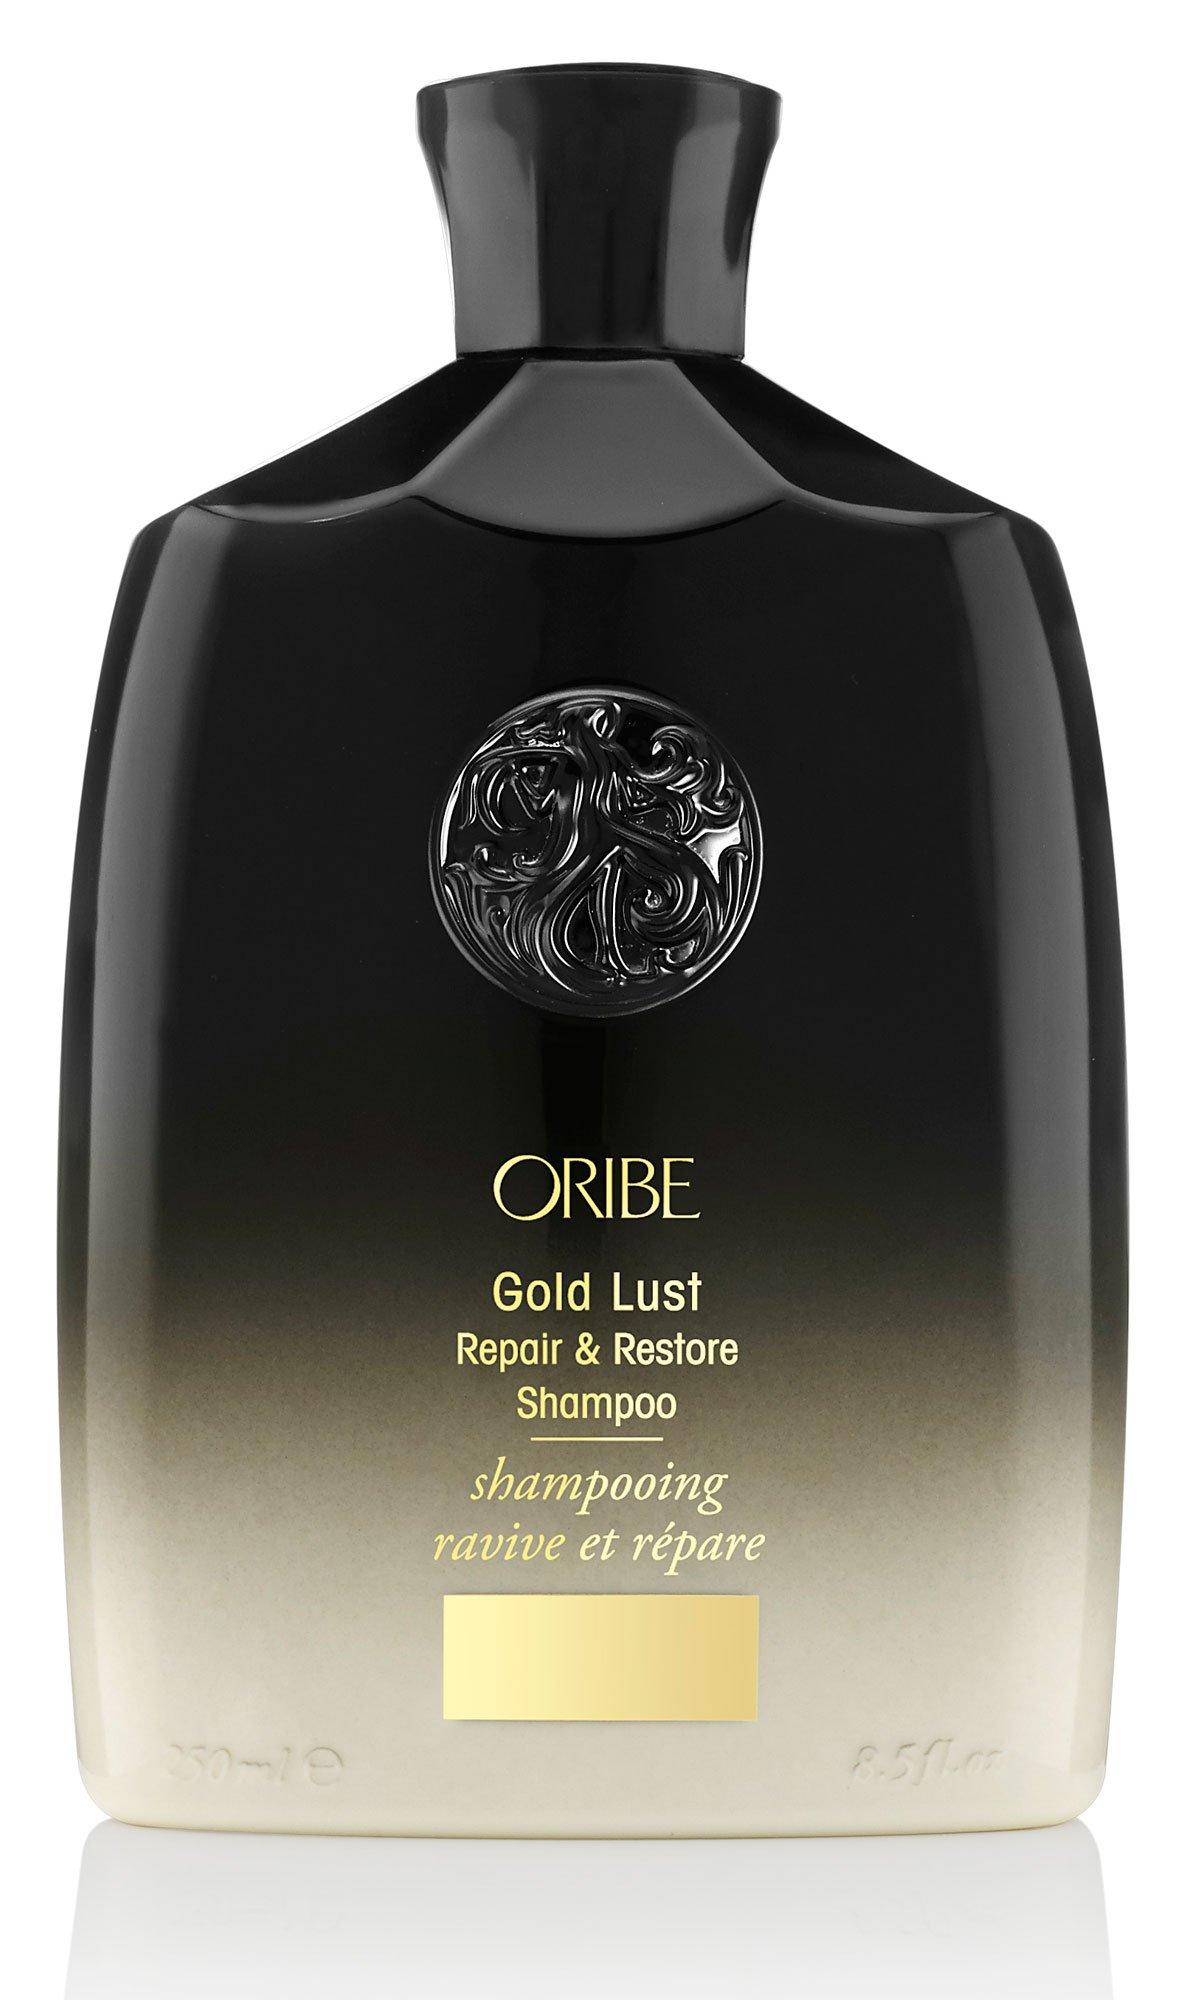 ORIBE Gold Lust Repair & Restore Shampoo 8.5 Fl Oz by ORIBE